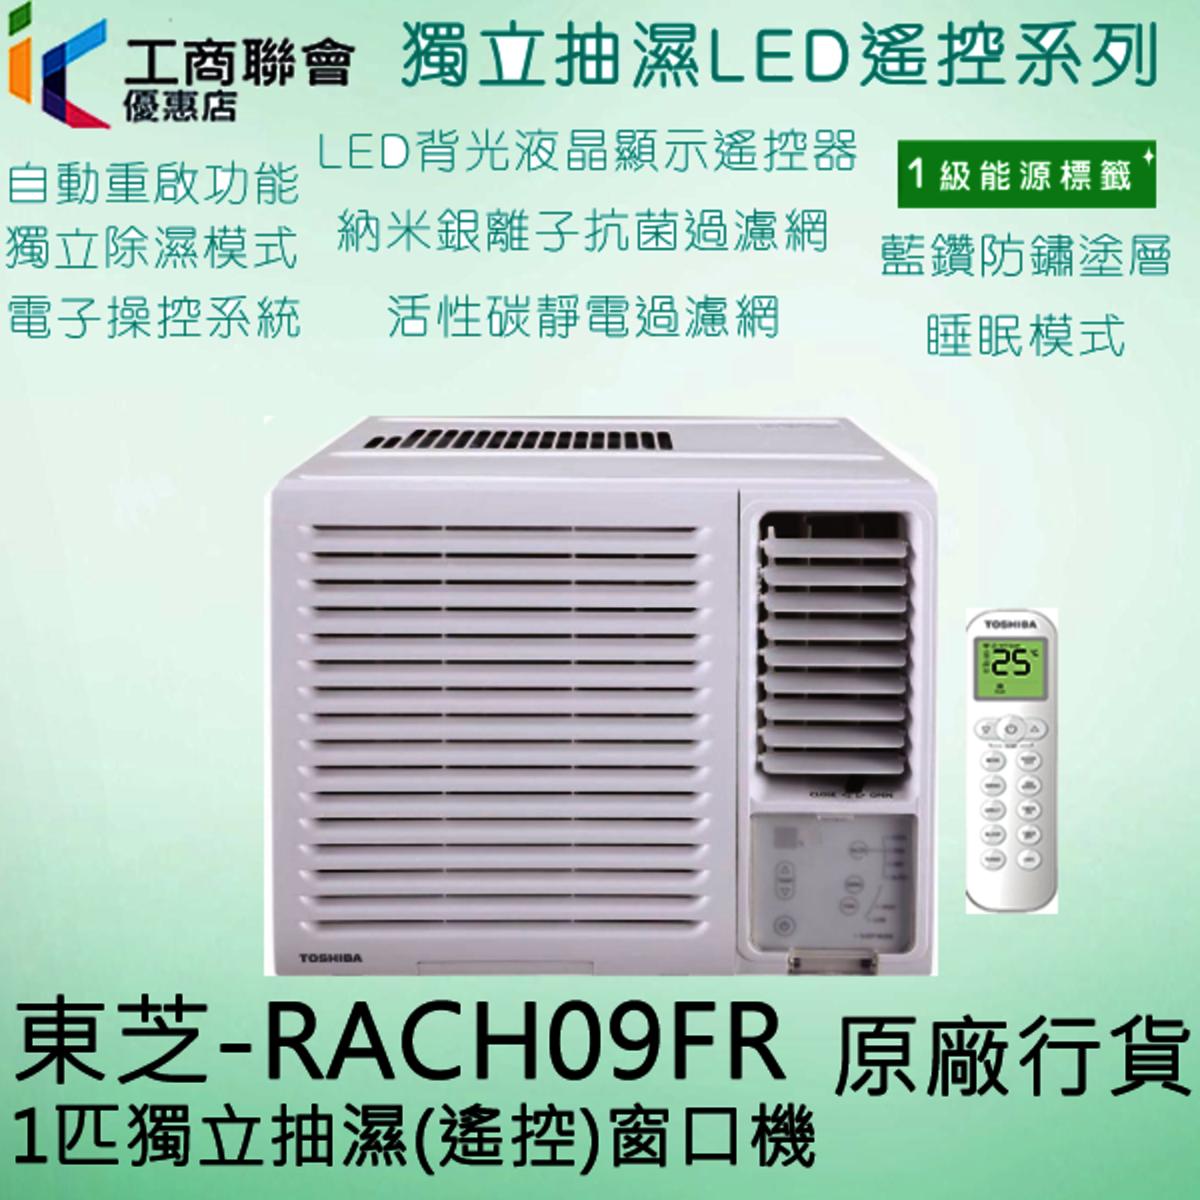 RACH09FR   1匹獨立抽濕(遙控)窗口式冷氣機 (窗口機 香港區現不接安裝服務,不便之處,敬希見諒!!!)